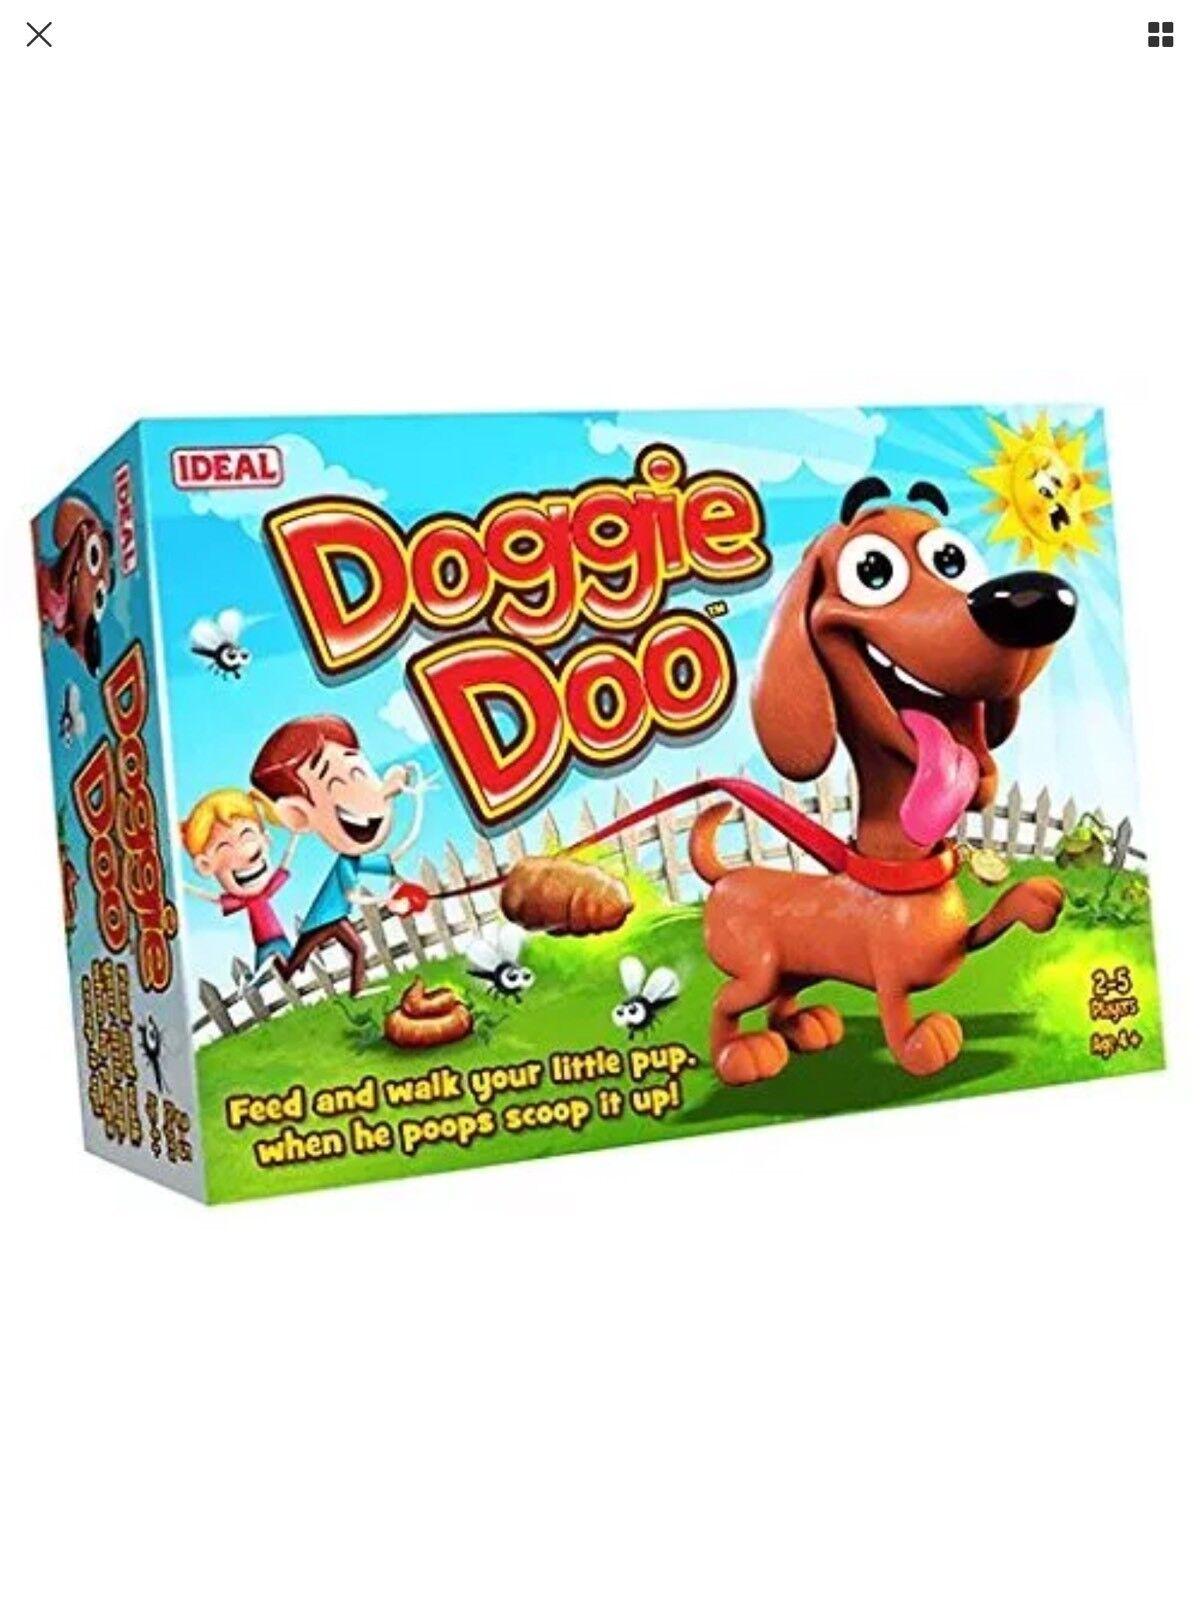 IDEAL  Doggie Doo Game New Sealed Ship Worldwide